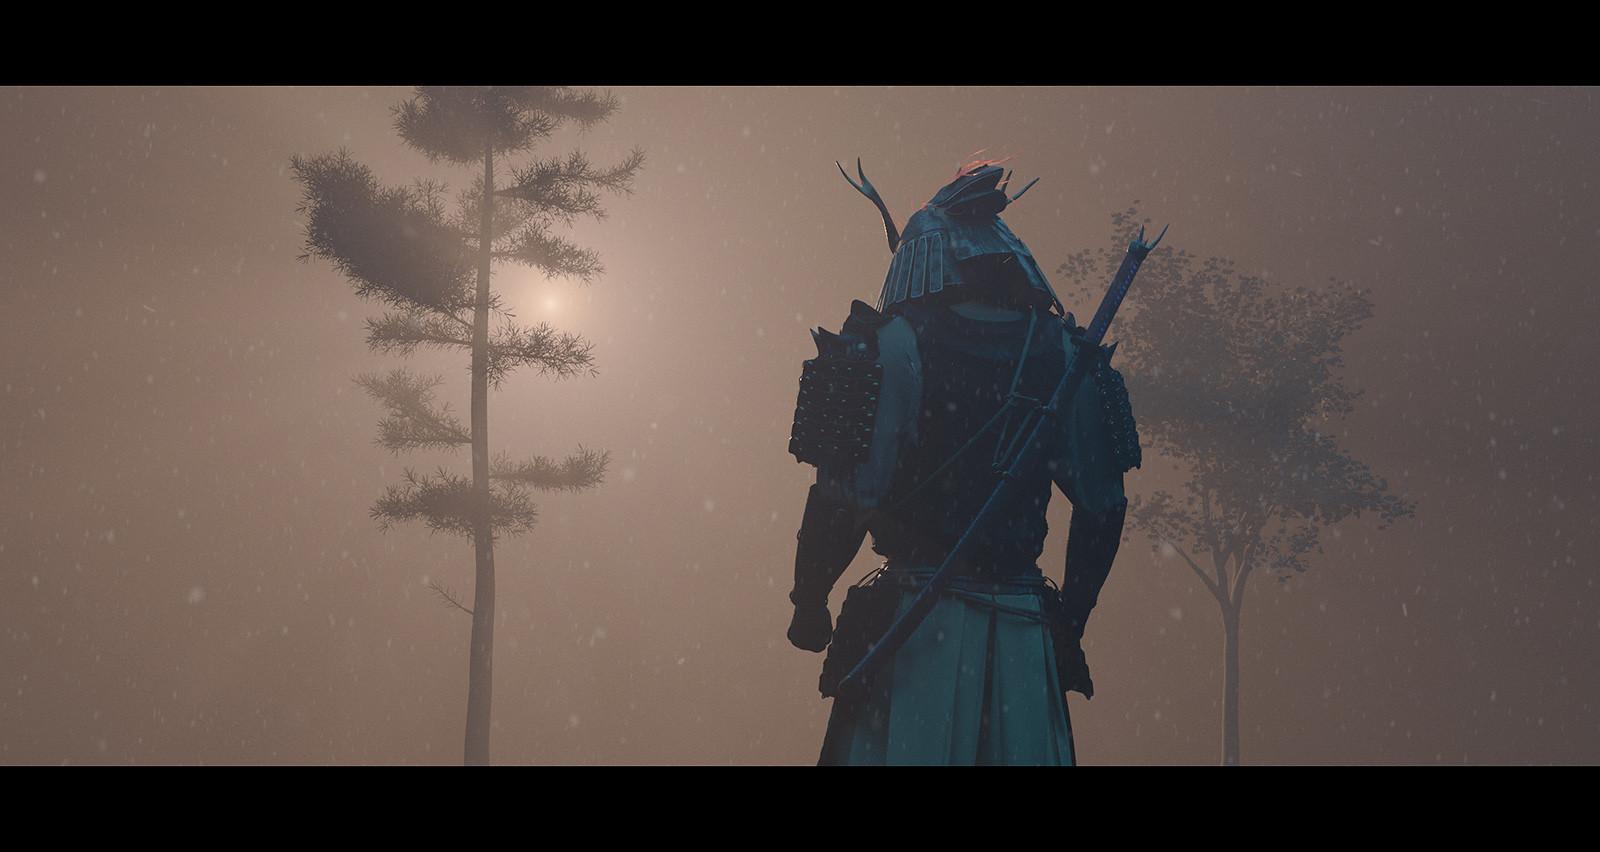 Lorenz hideyoshi ruwwe samurai cine2 s